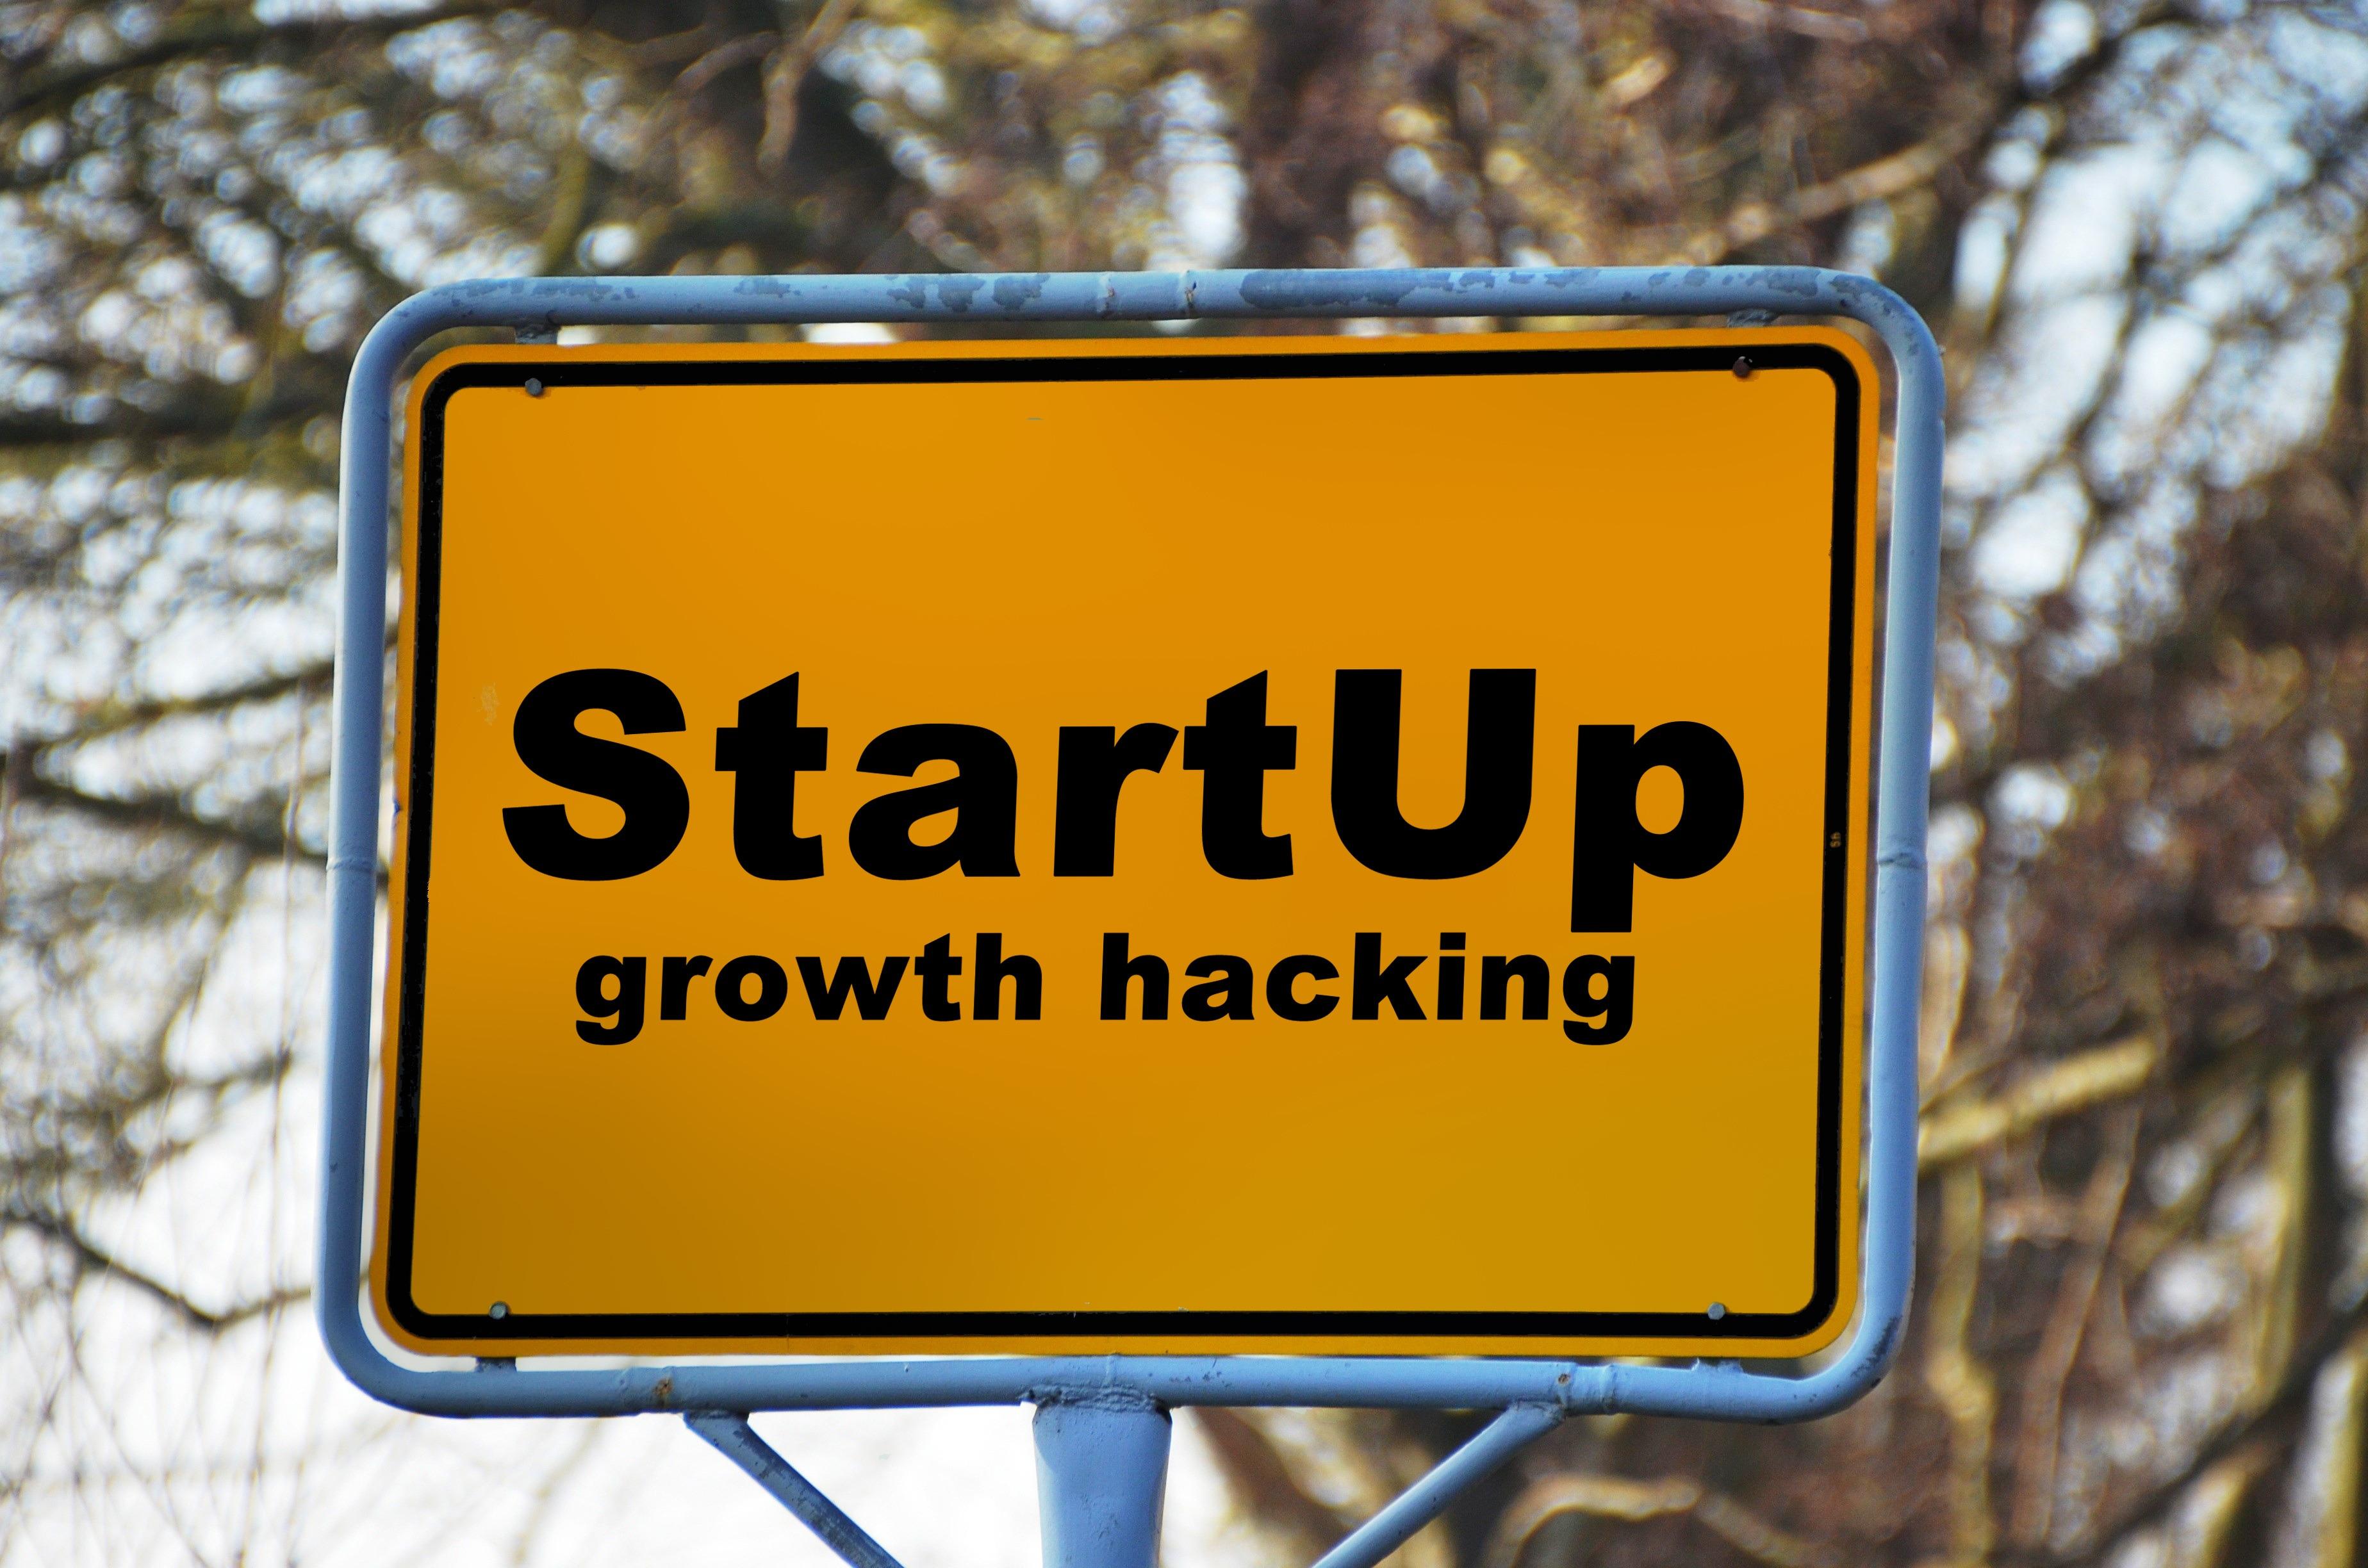 Startups Growth Hacking